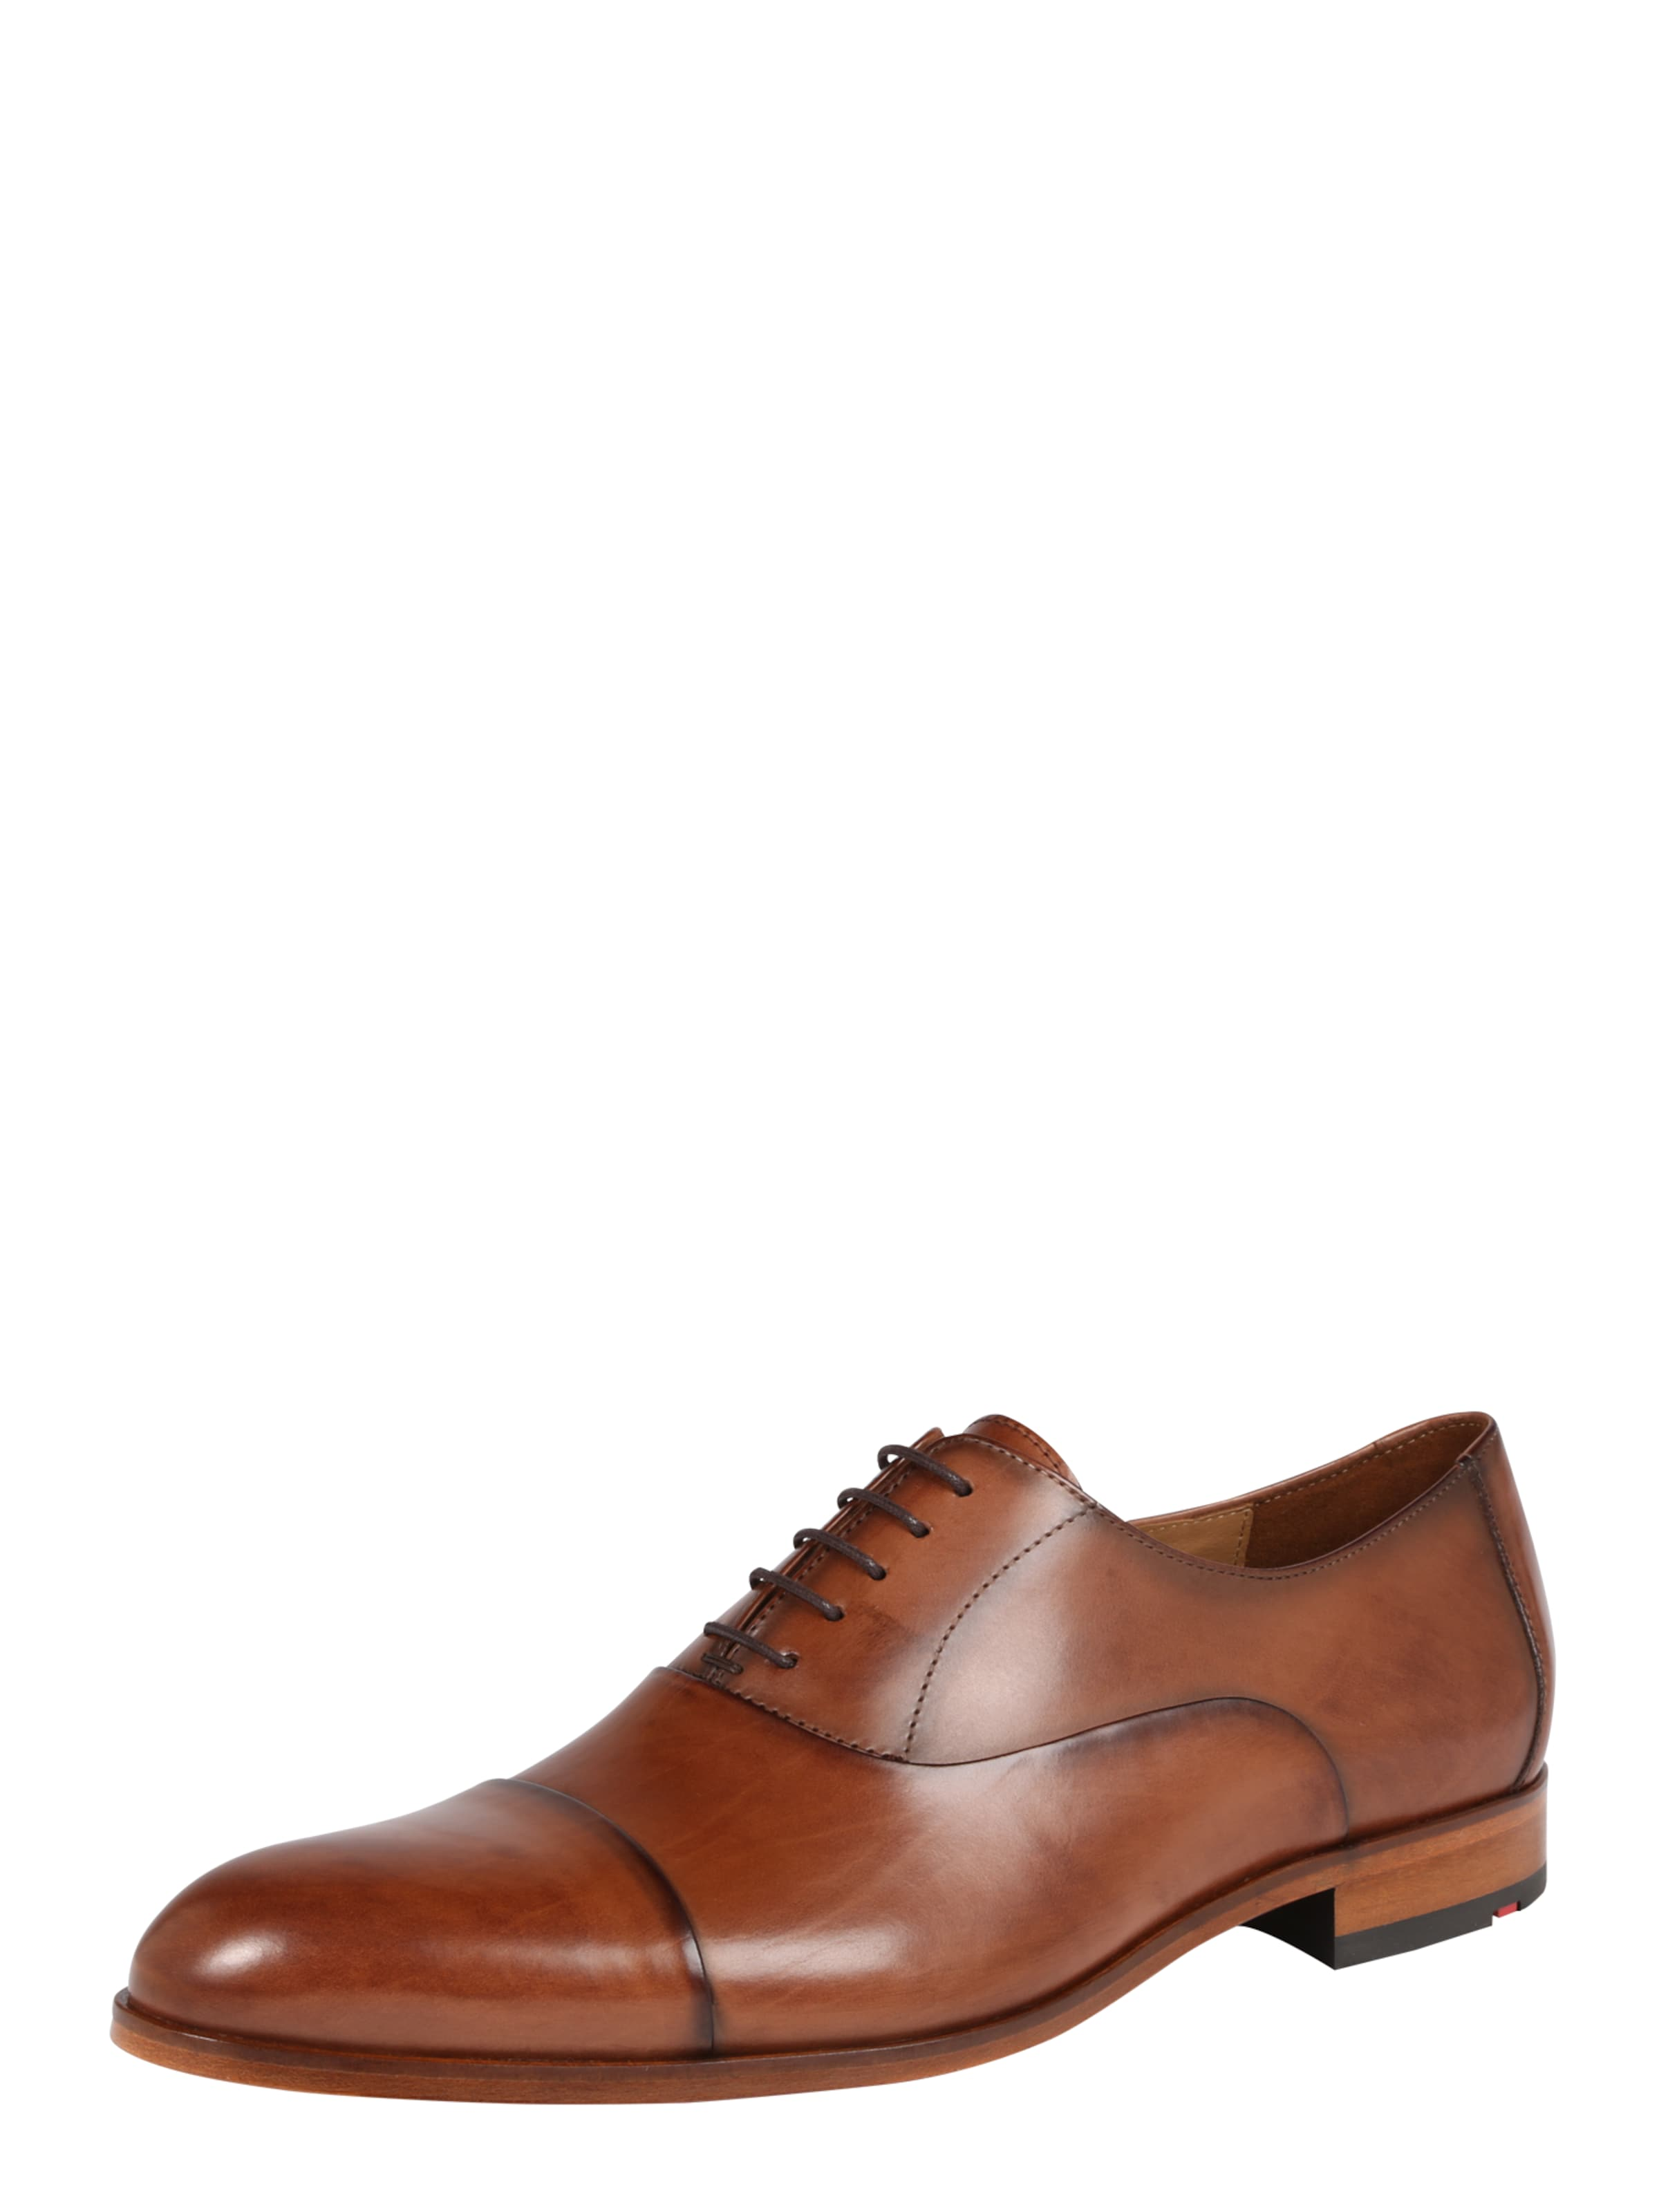 LLOYD Halbschuhe MALIK Verschleißfeste billige Schuhe